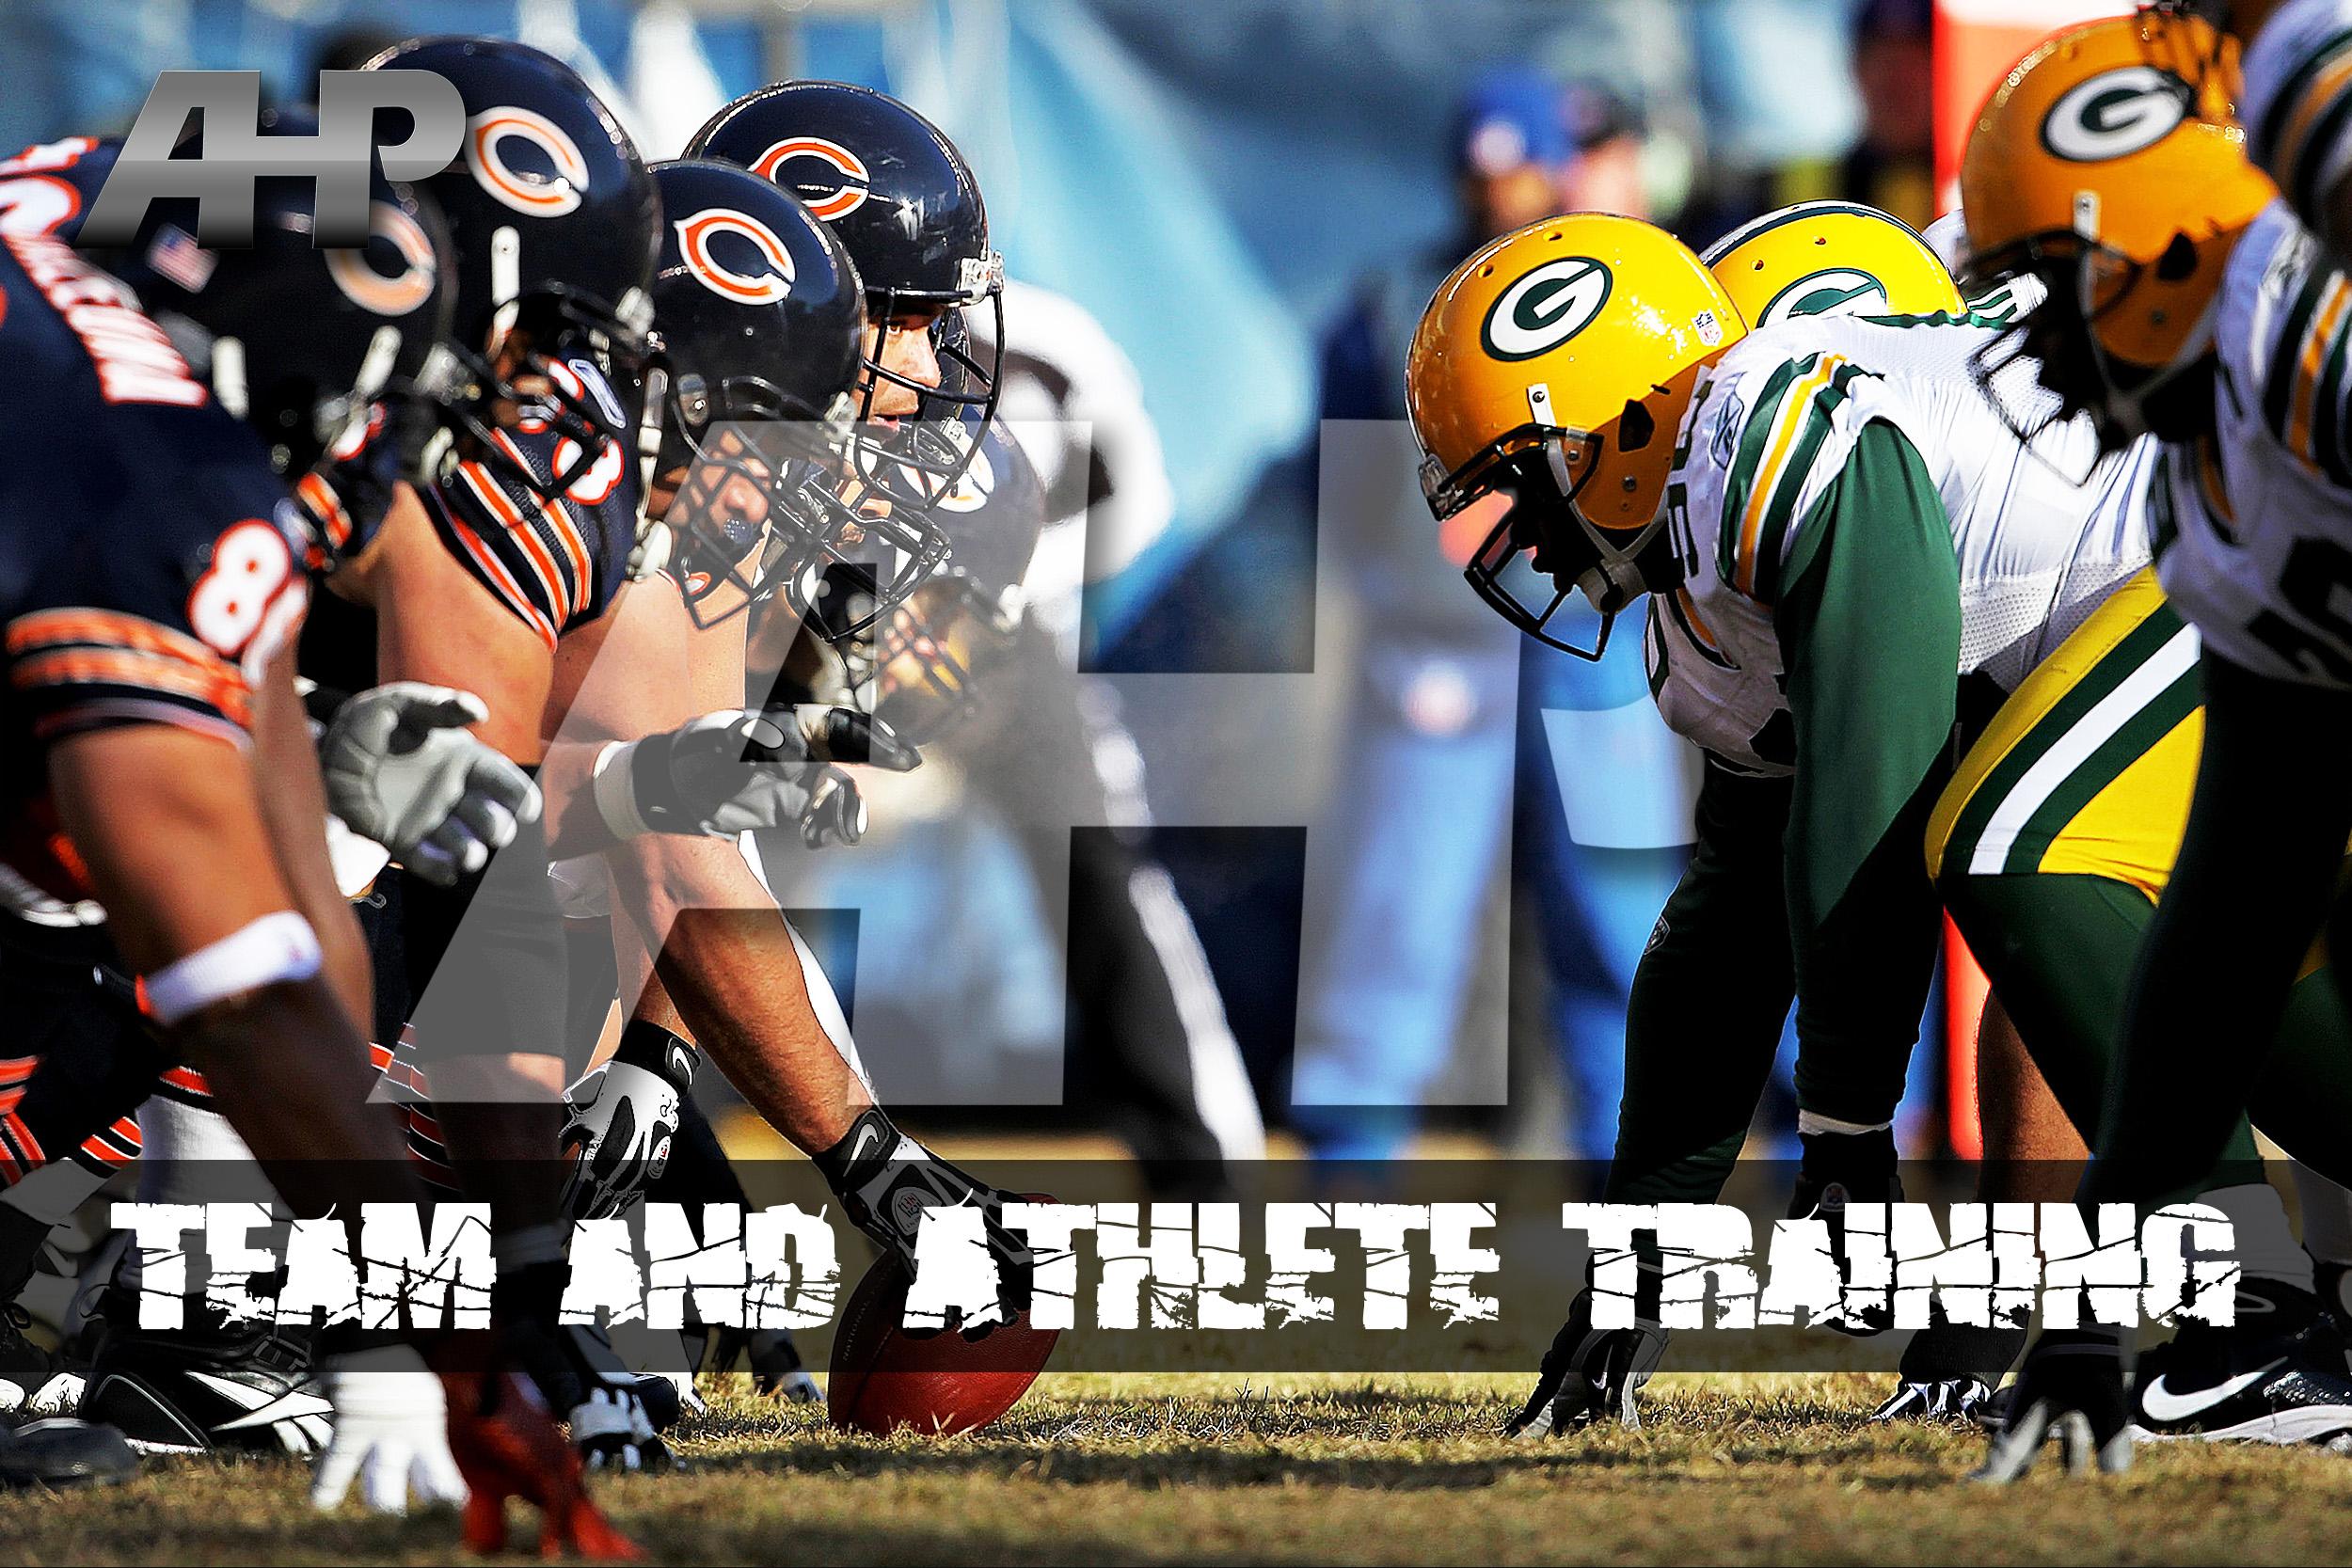 Team and Athlete Training Thumbnail - AHP.jpg